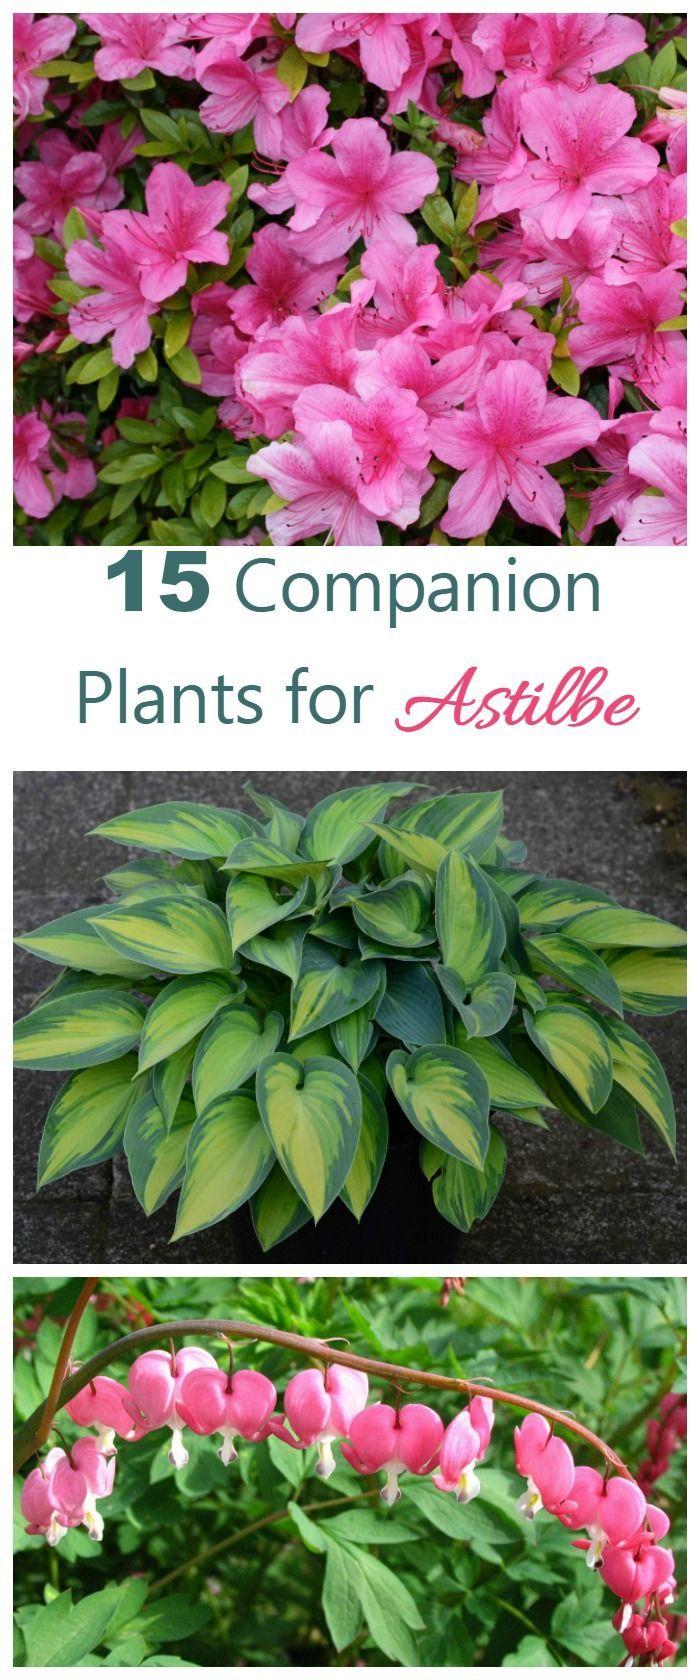 2620 Best Gardening Images On Pinterest Flower Beds 400 x 300